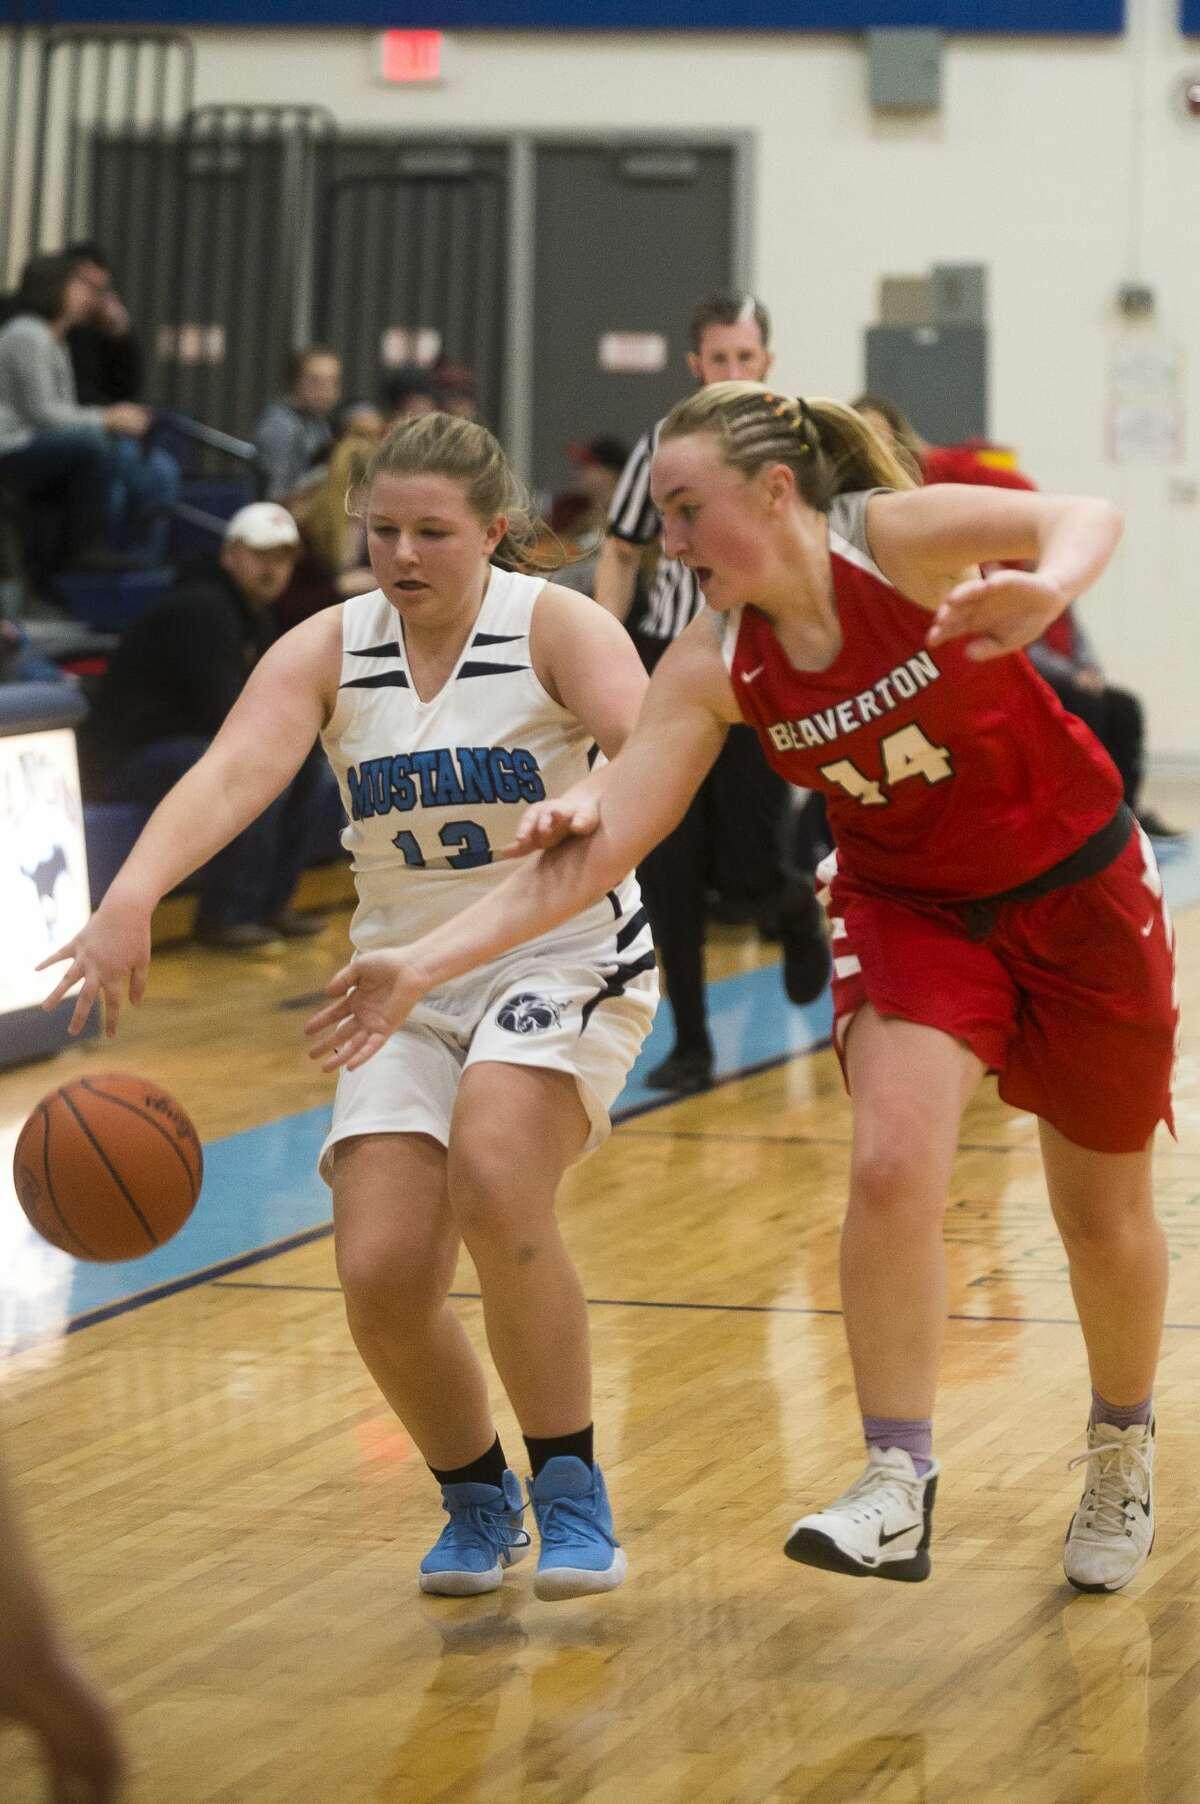 Meridian junior Karley Kent and Beaverton senior Ann-Marie Hicks fight for possession during their game on Friday, Jan. 5, 2018 at Meridian High School. (Katy Kildee/kkildee@mdn.net)